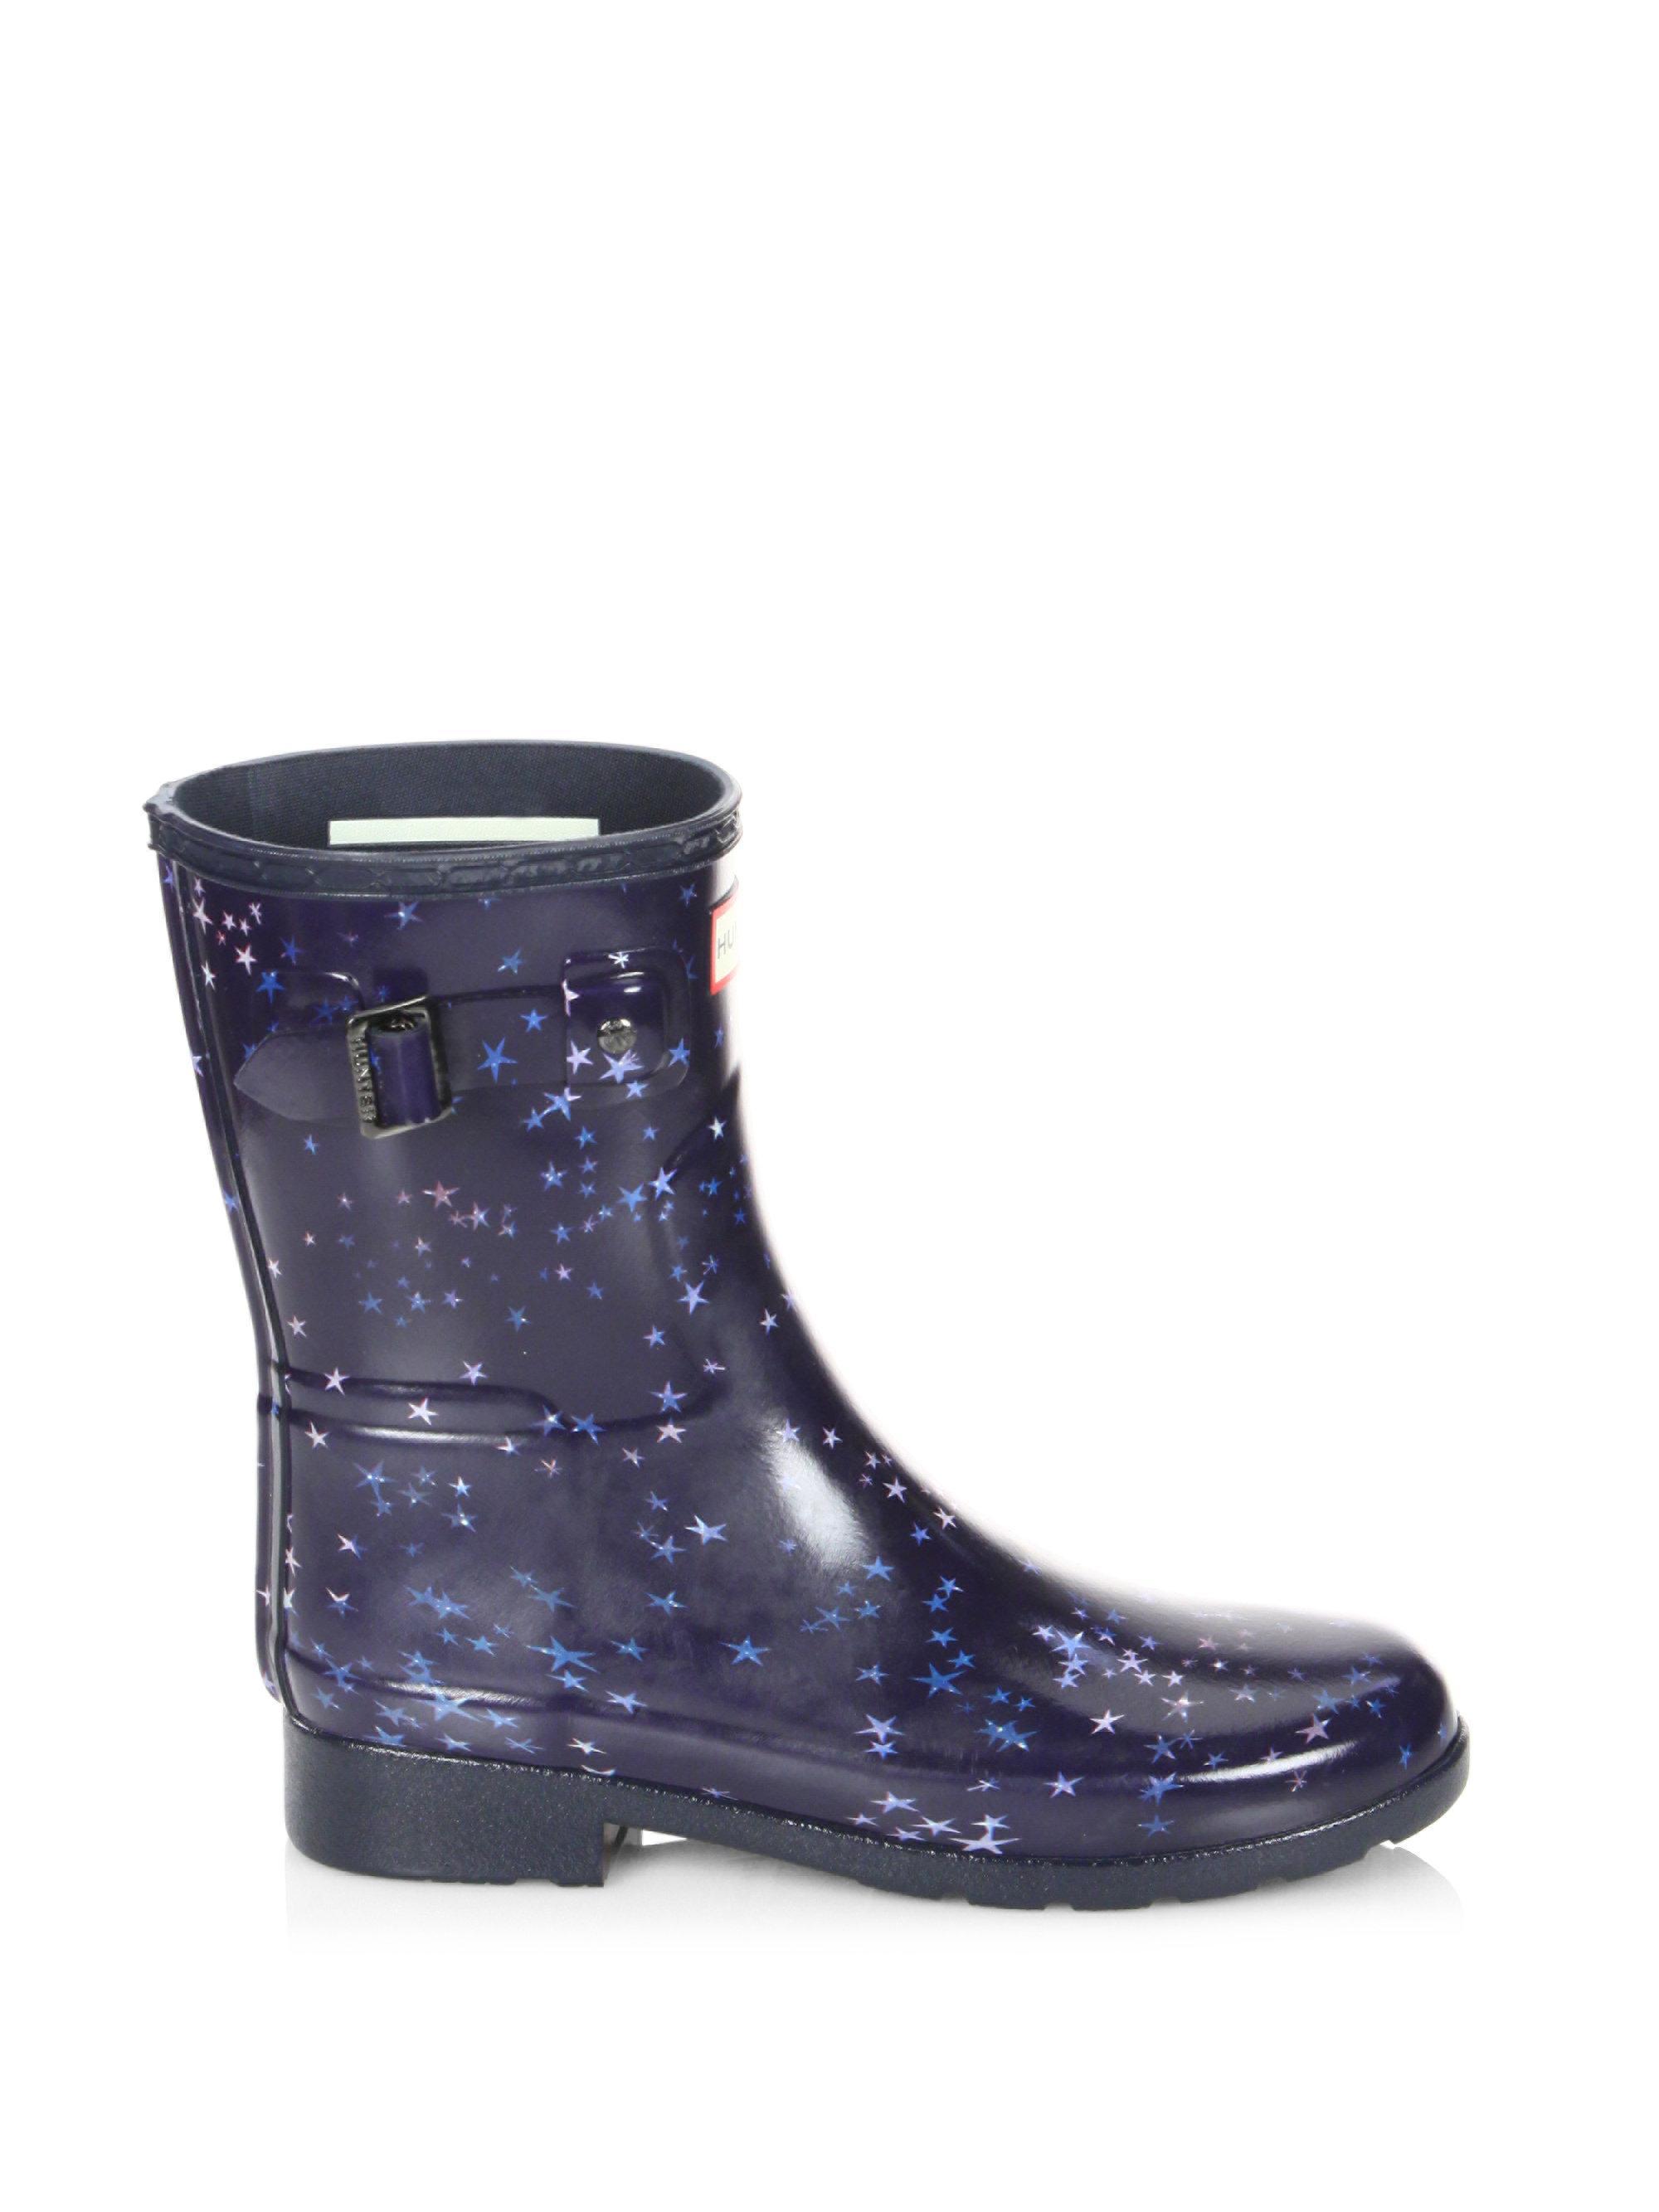 Lyst Hunter Refined Constellation Print Short Rain Boots